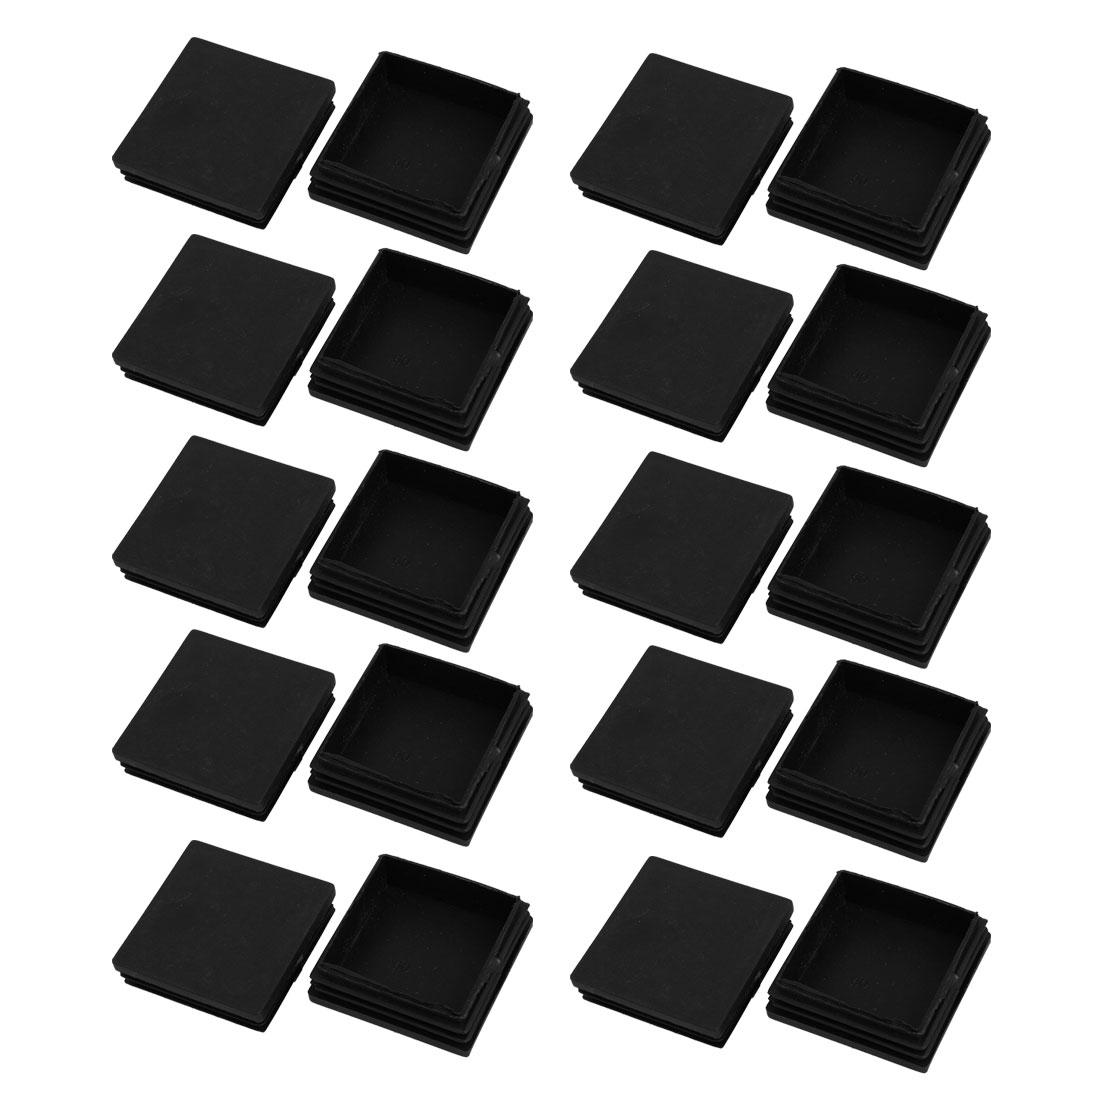 20pcs 60x60mm Black Plastic Square Cabinet Leg Insert Cover Protector